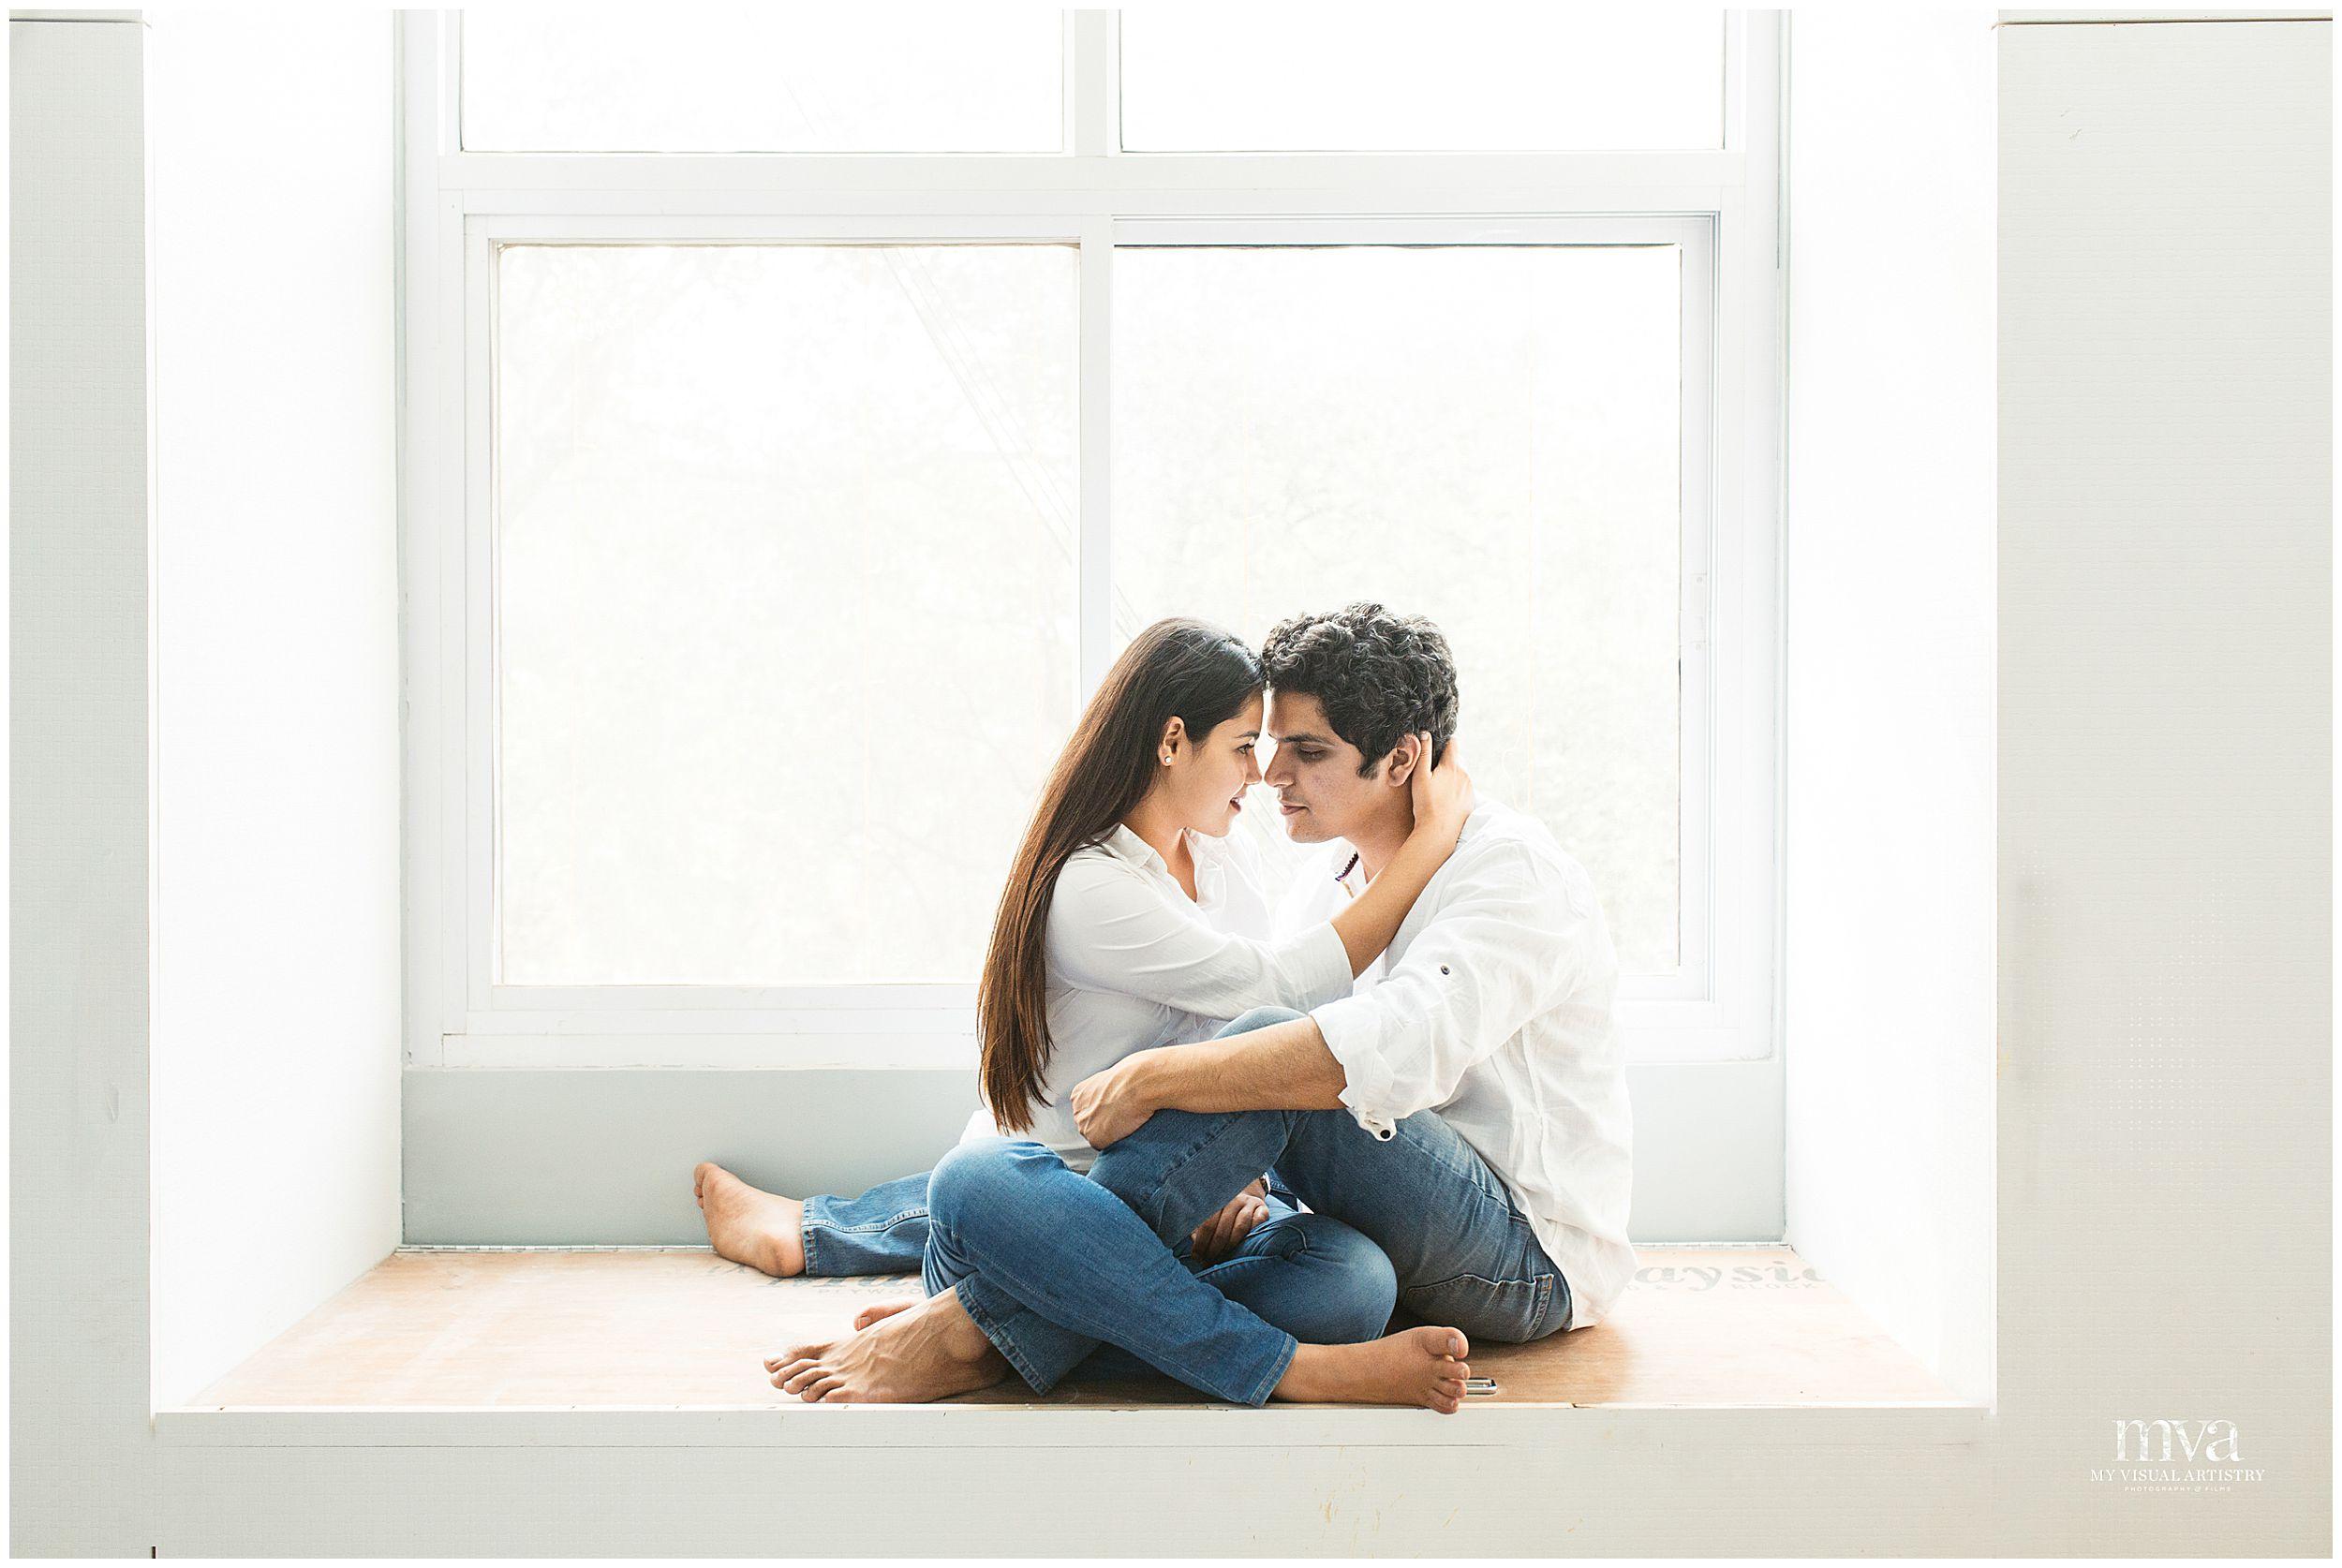 SAHIL_MANALI_MYVISUALARTISTRY__WEDDING_PHOTOGRAPHER_JANNATVALLEY_COUPLESHOOT_DESTINATION_FARIDABAD_PREWEDDING21.jpg